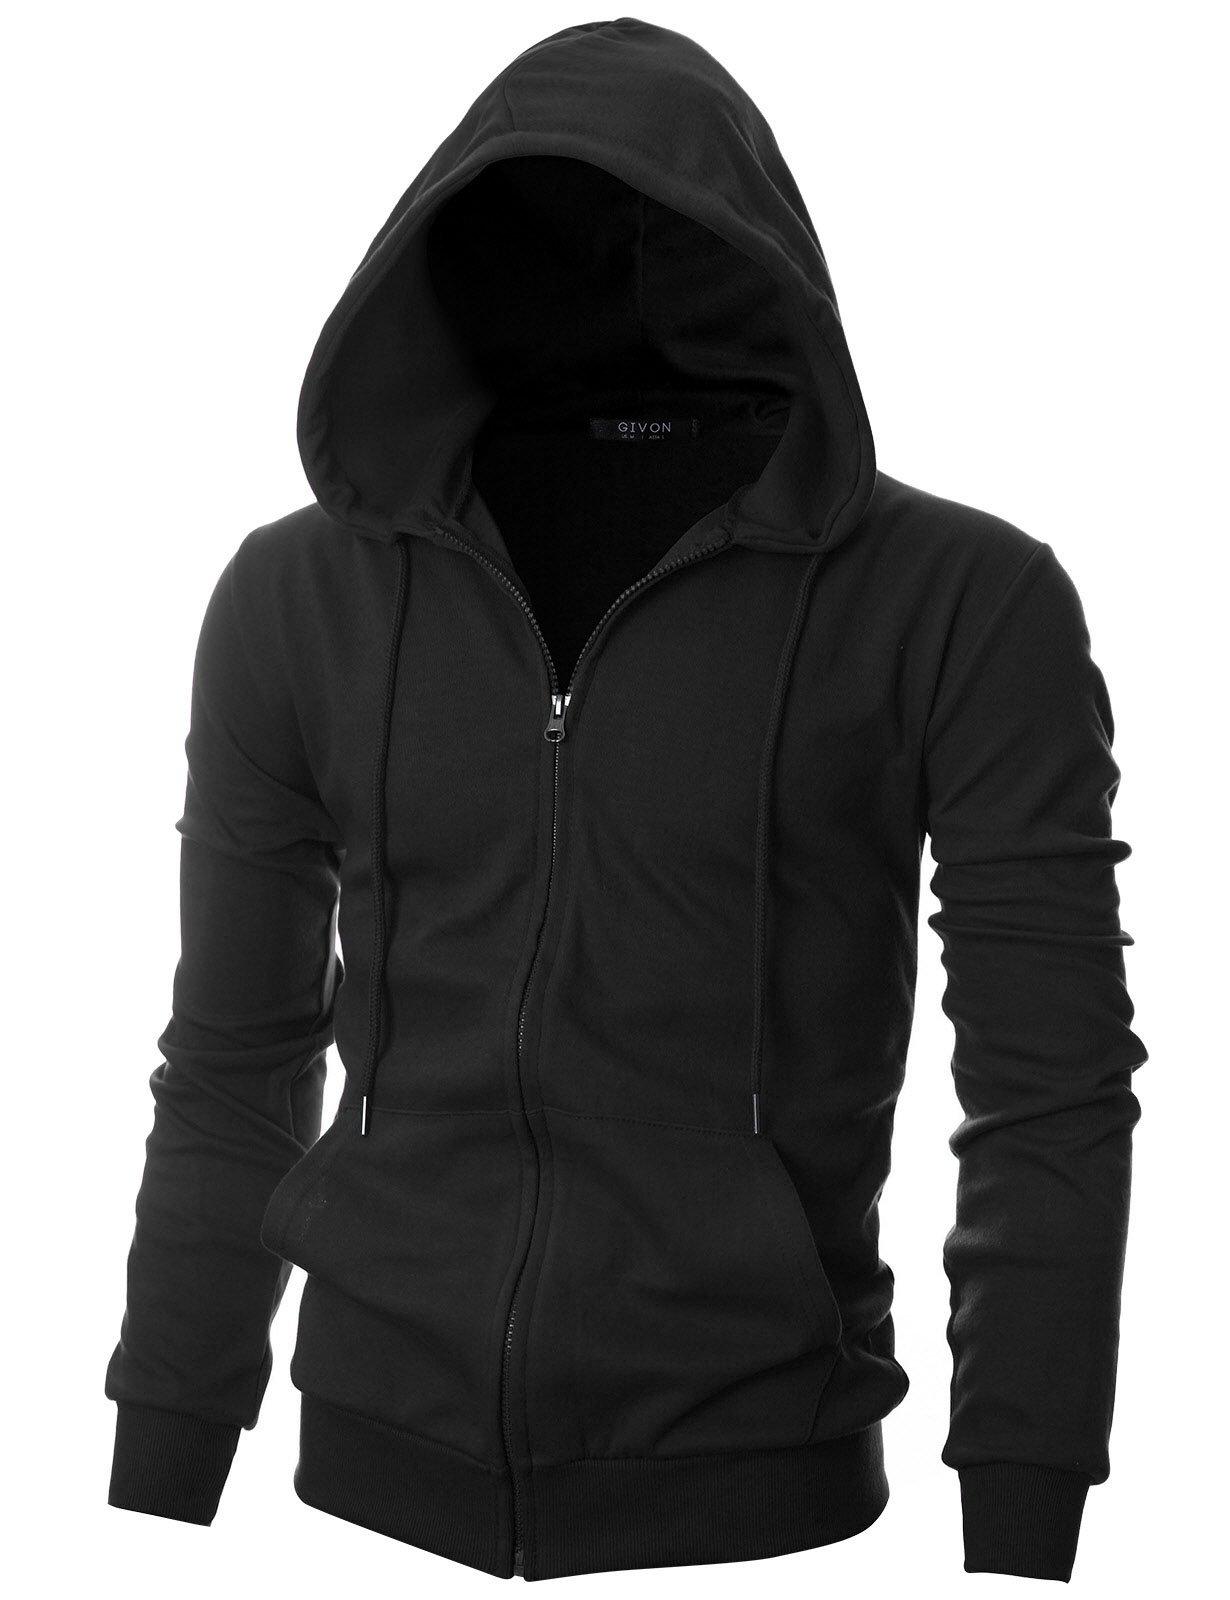 GIVON Mens Slim Fit Long Sleeve Lightweight One-Tone Zip-up Hoodie with Kanga Pocket/DCF036-BLACK-S